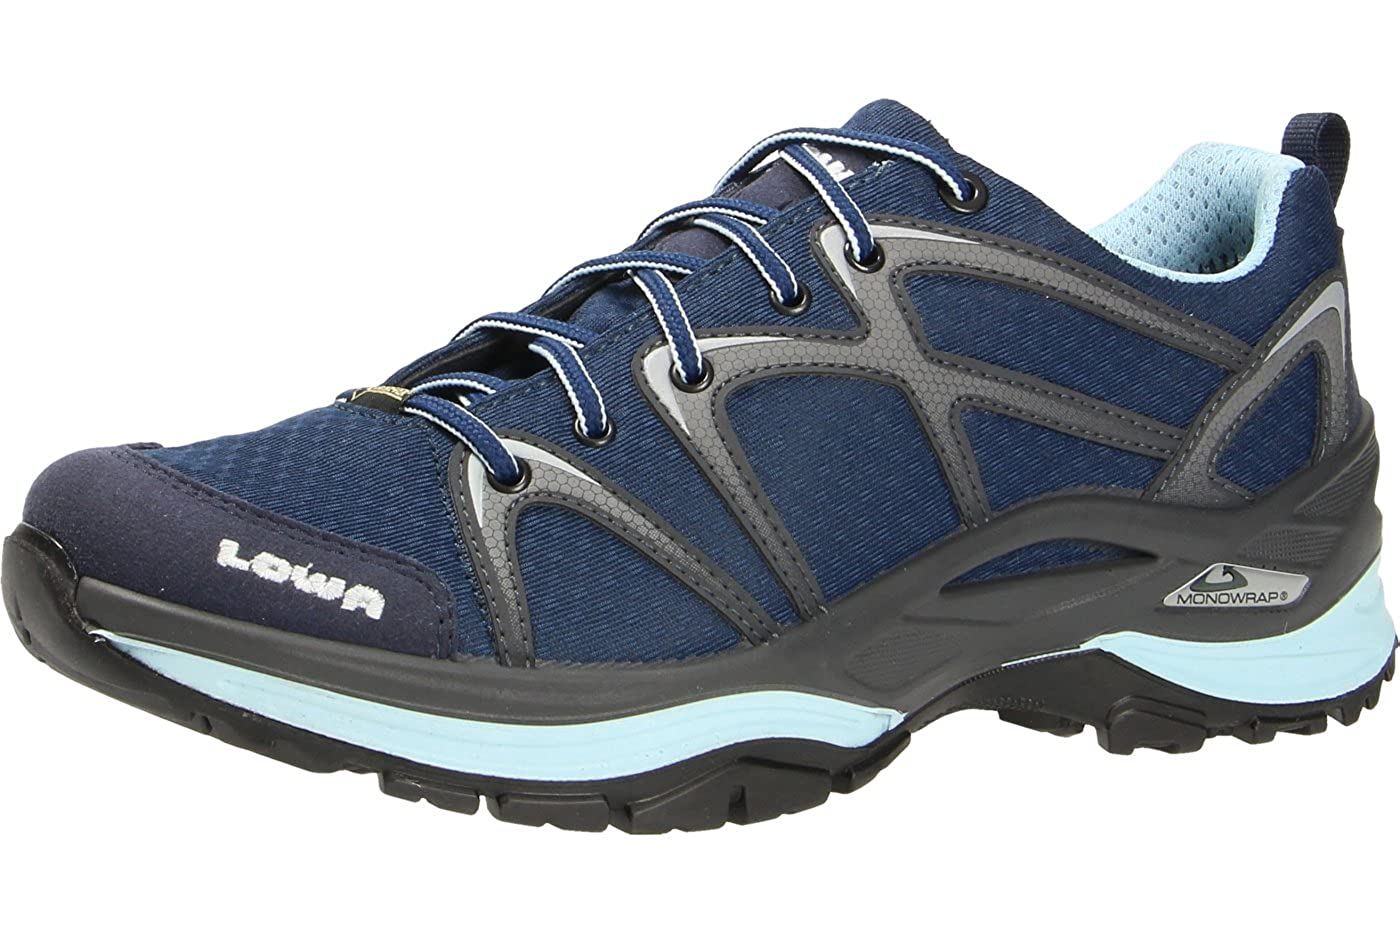 Donne LOWA blu INNOX GTX® LO Ws Trainer 37 38 39 40 4142 320606-6917 marina